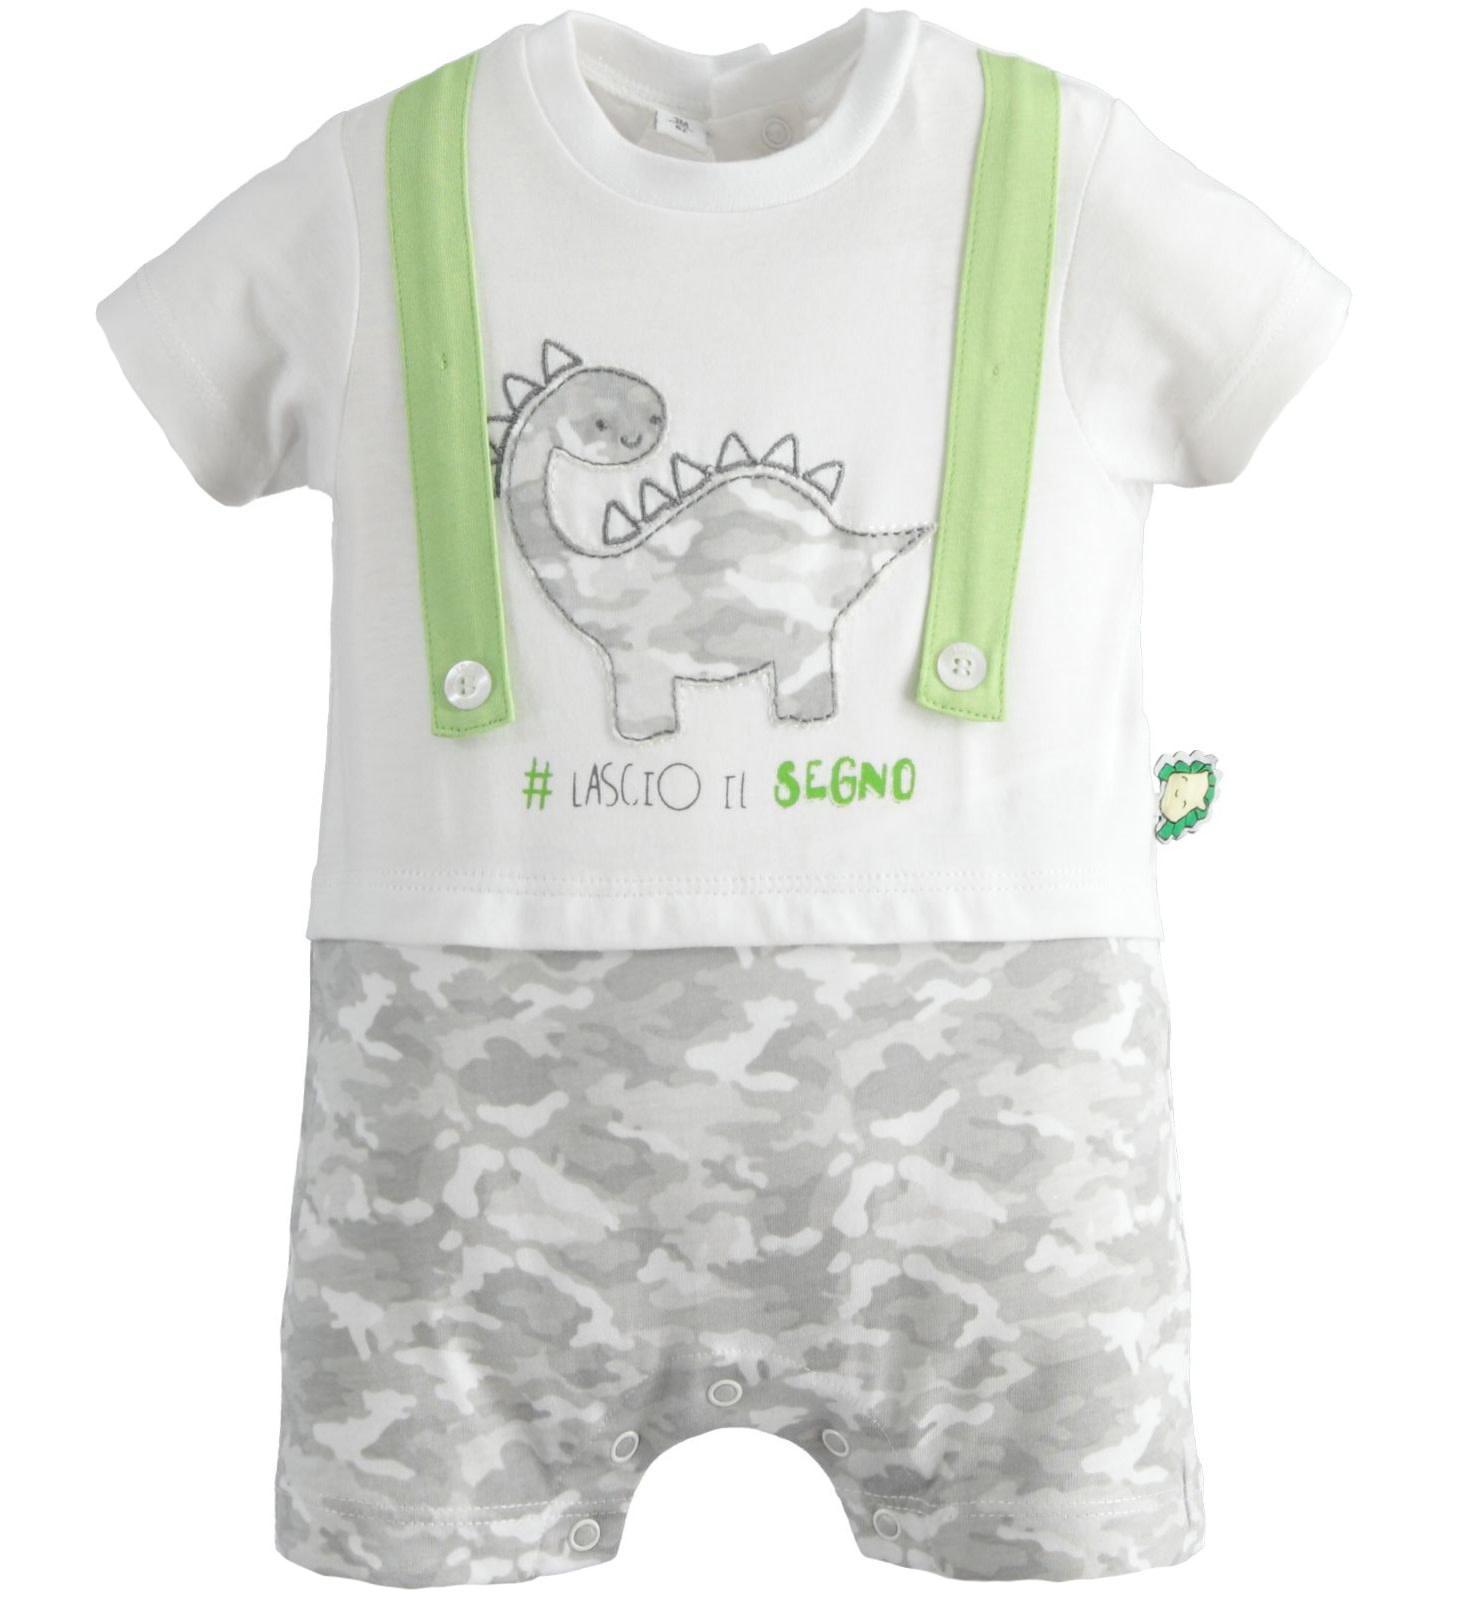 iDo iDO SS20 Baby Boy All in one dinosaur romper J086